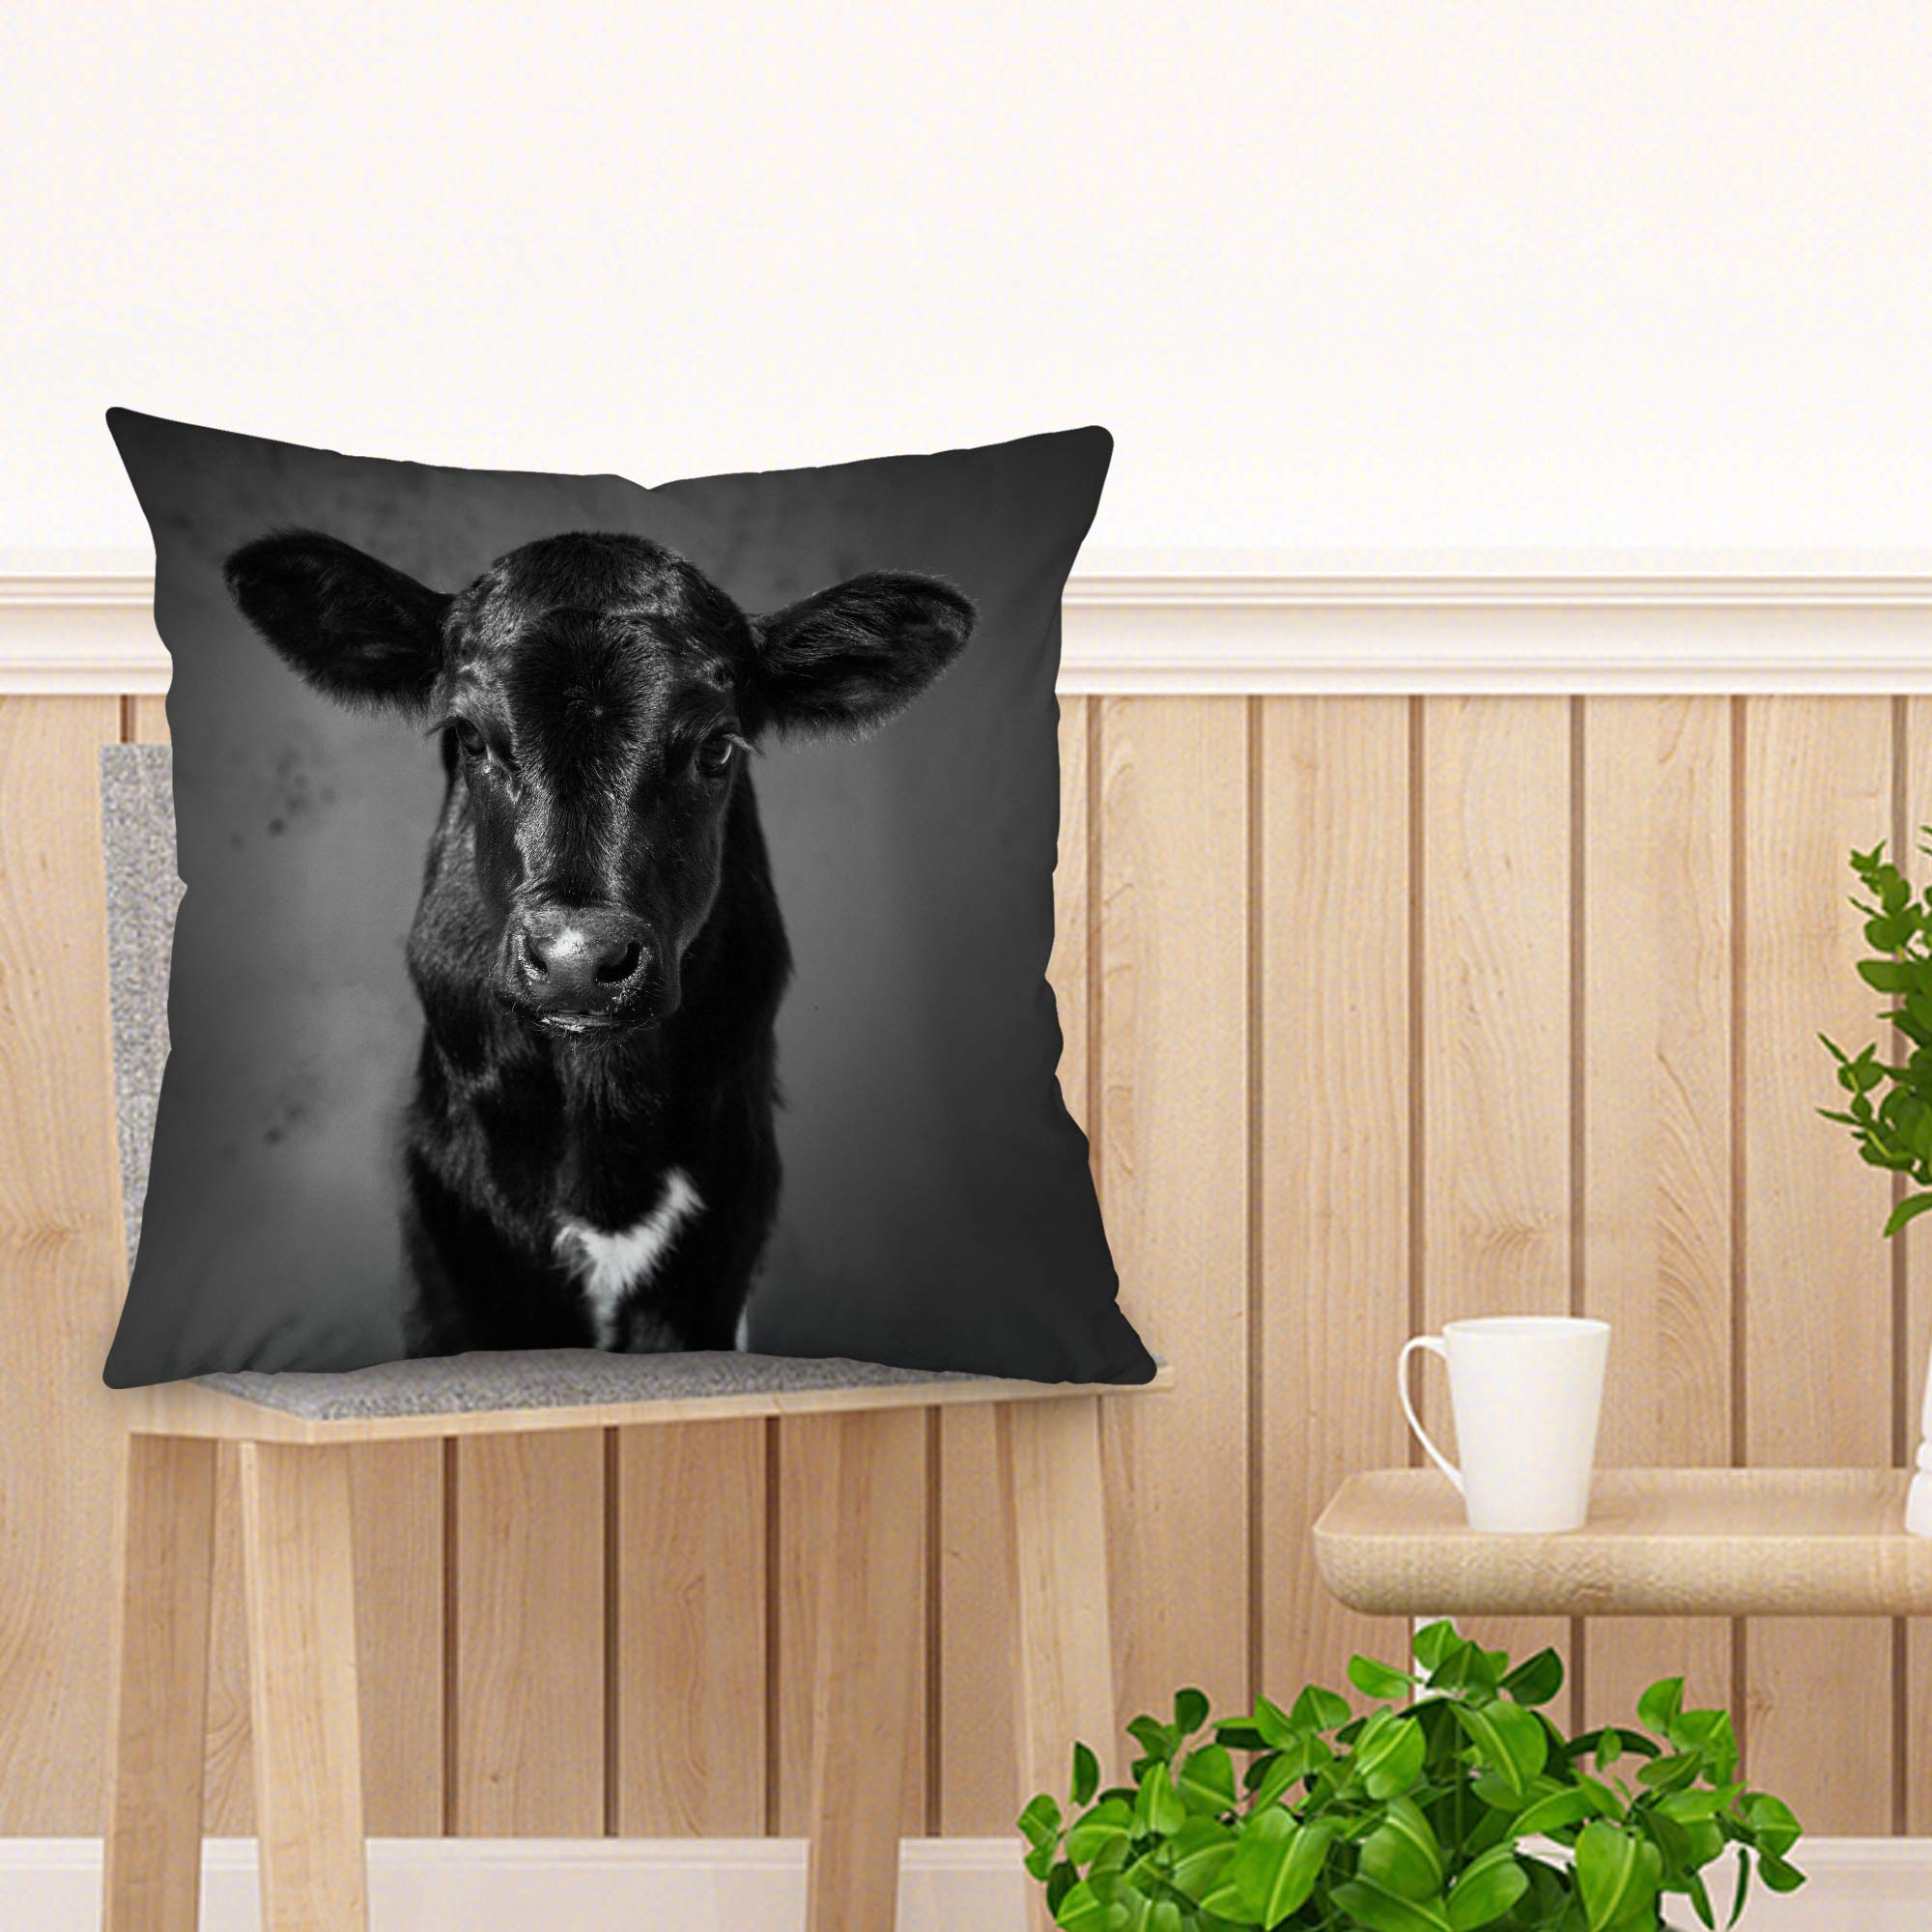 Single Country Baby Black /& White Calf Pillow Case